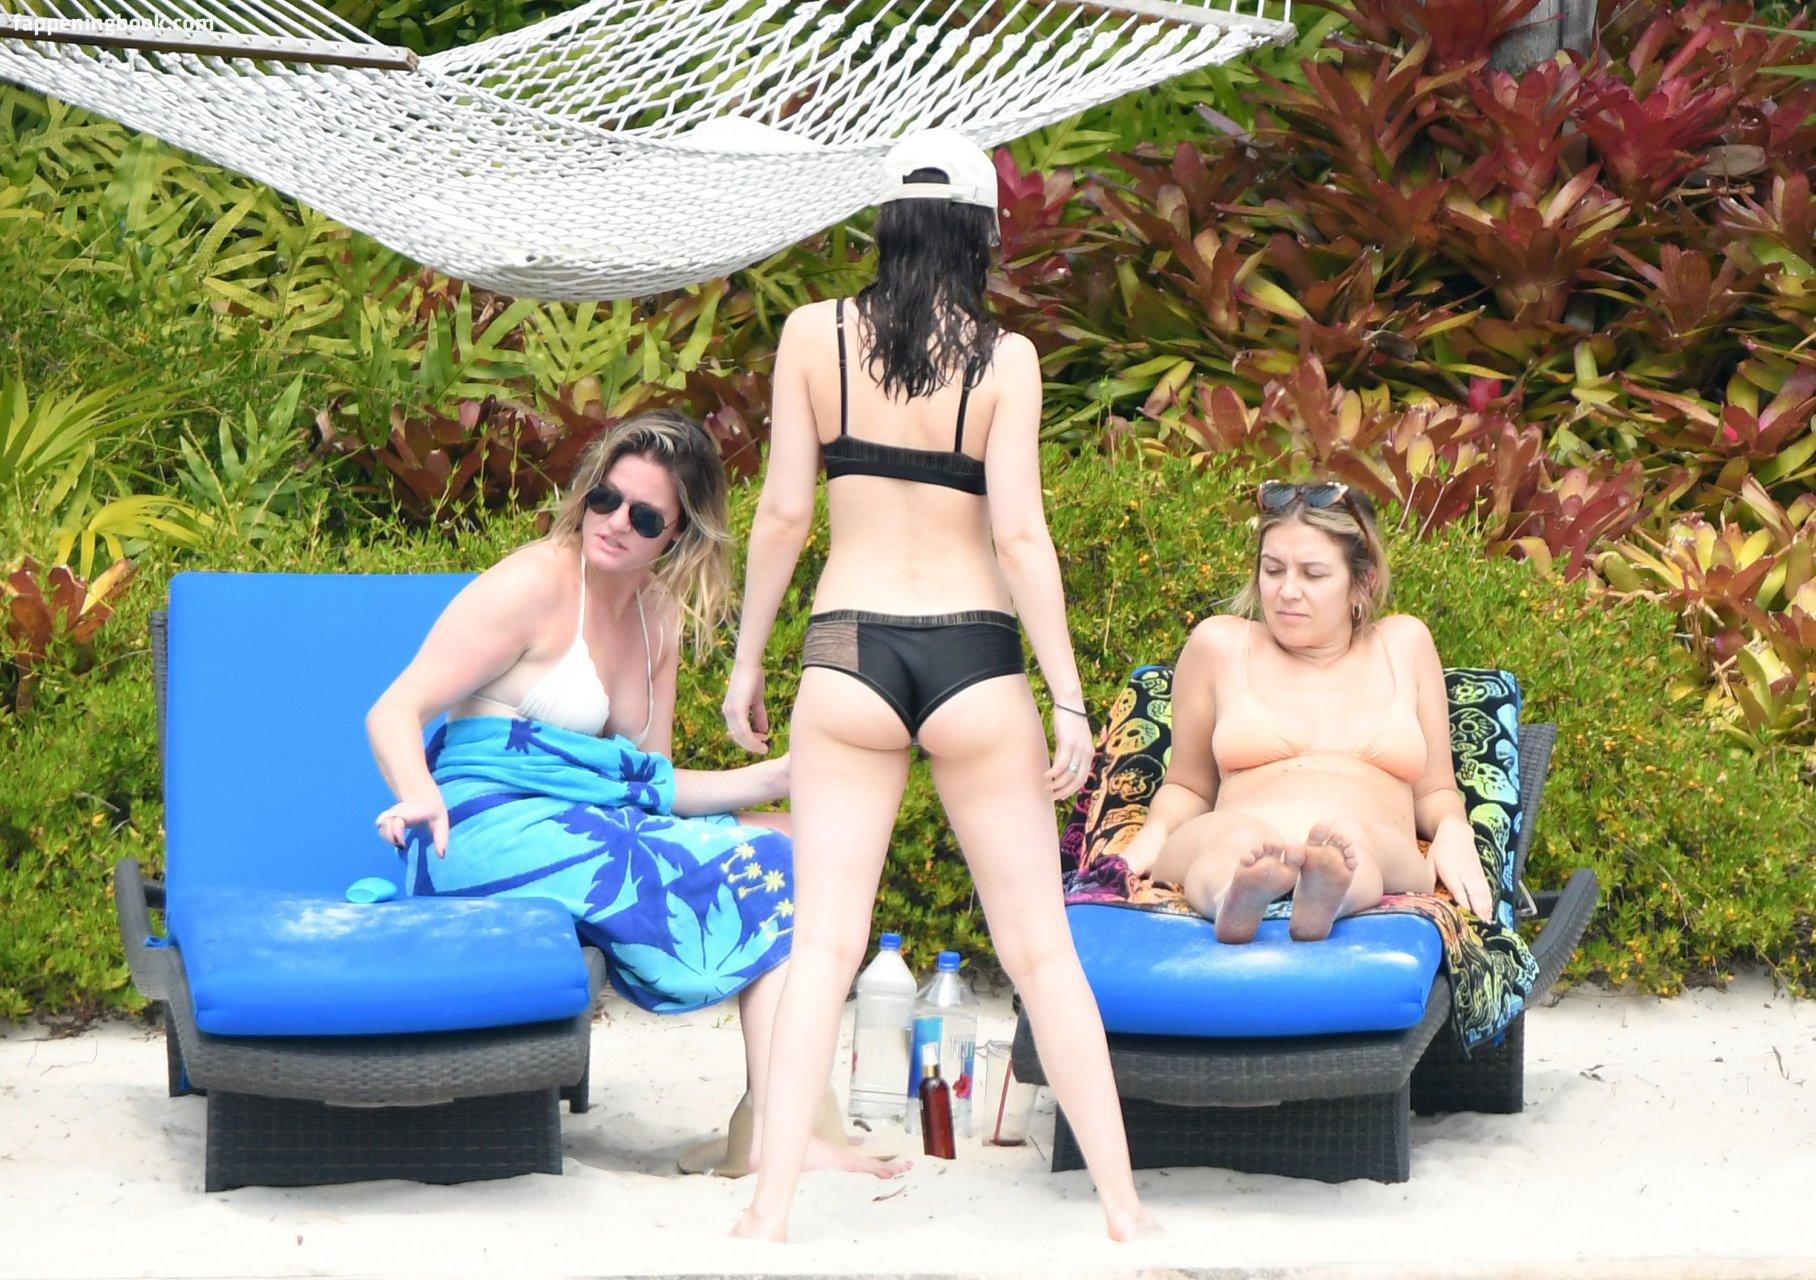 Dakota johnson fappeng - Thefappening.pm - Celebrity photo